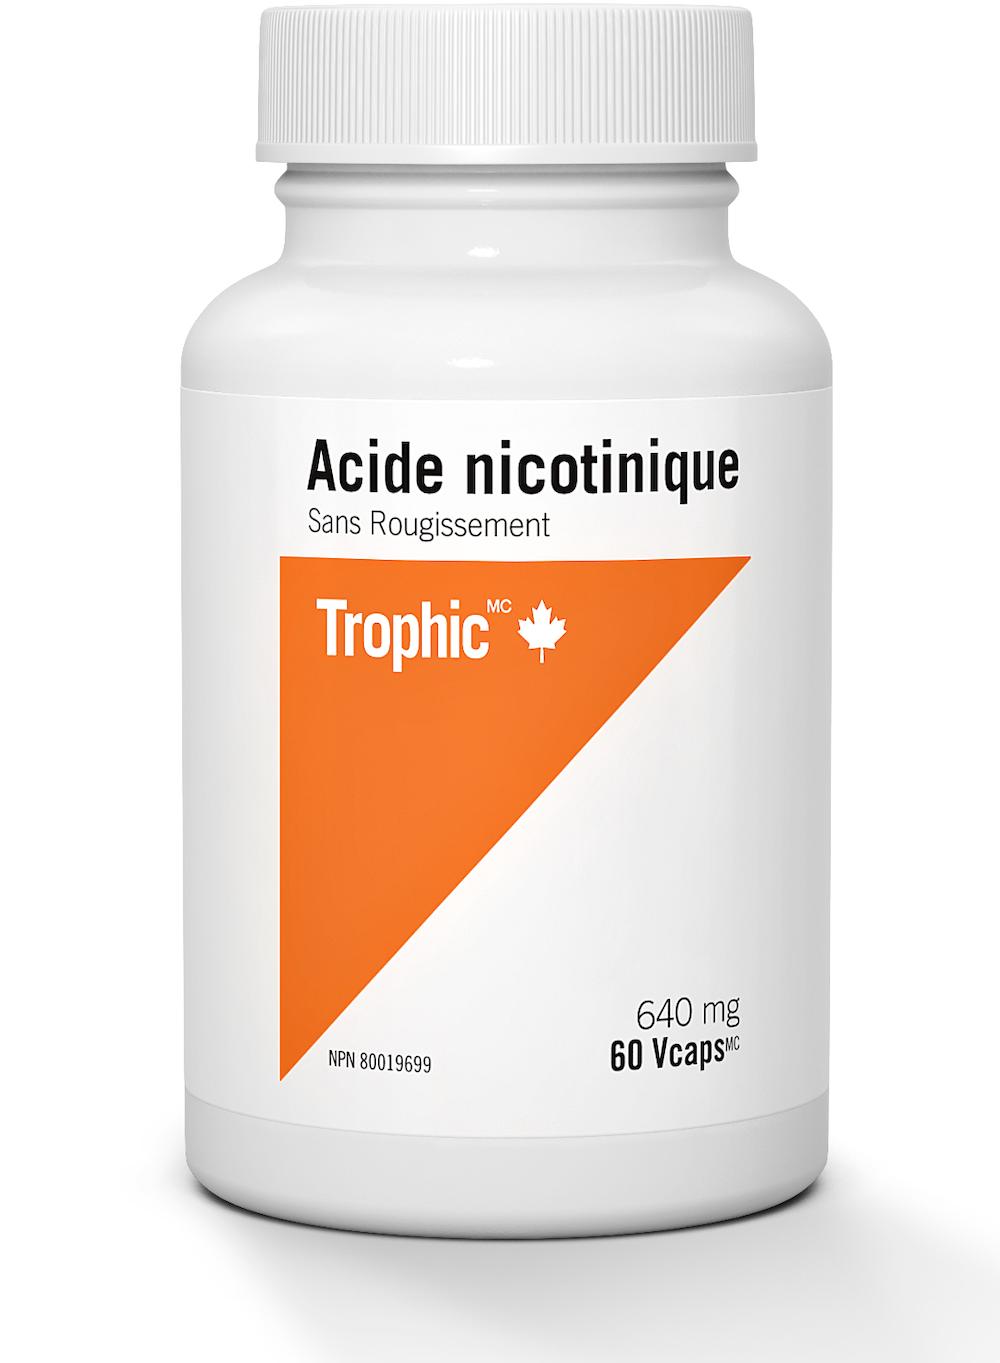 Acide nicotinique